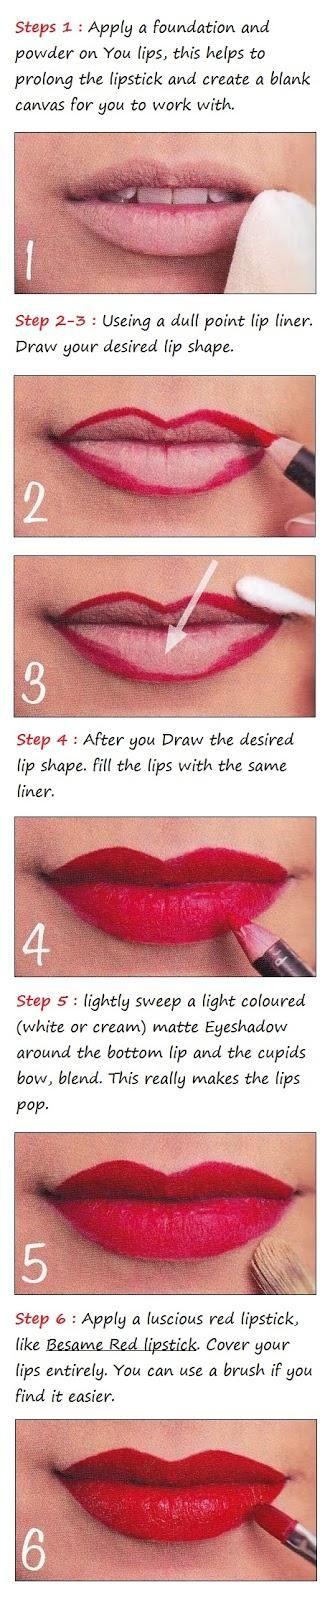 Glamorous Red Lips Tutorial